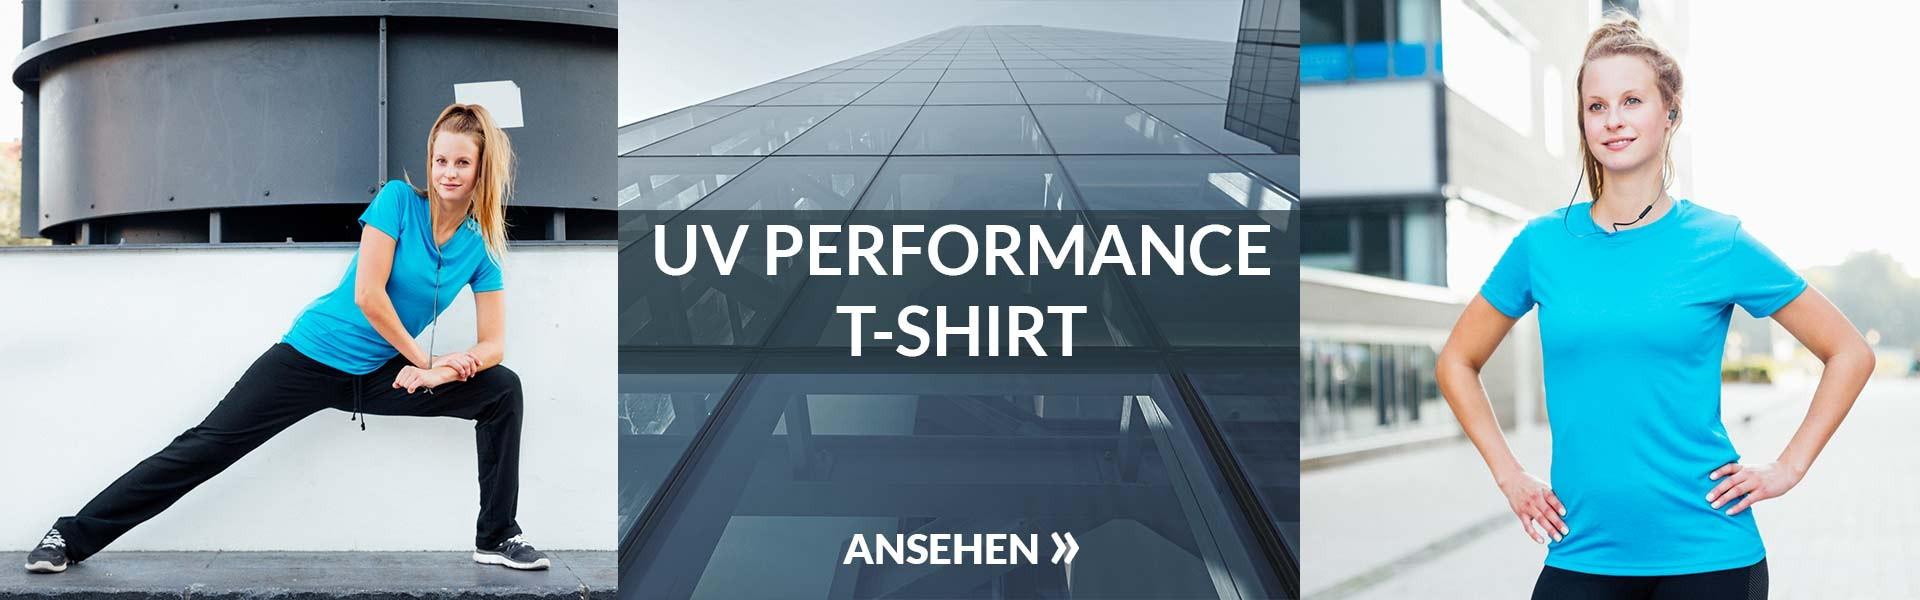 Uv Performance T-shirt Damen